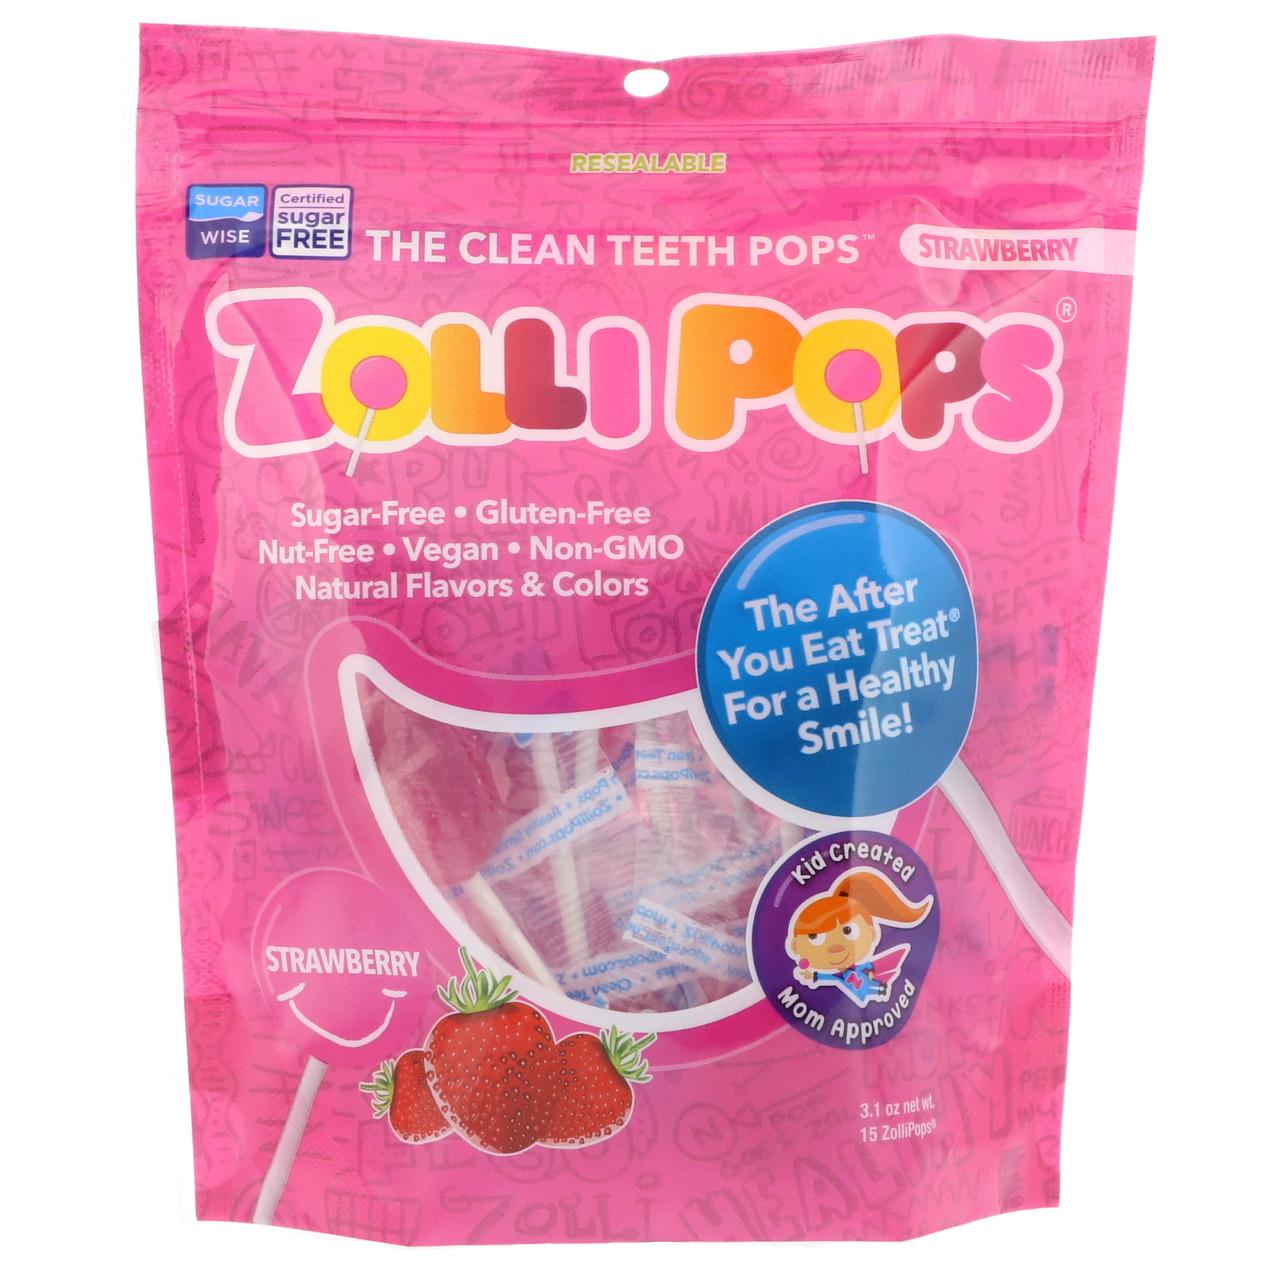 Zollipops , Леденцы на палочке The Clean Teeth Pops, с клубничным вкусом, 15 шт., (3,1 унц.)